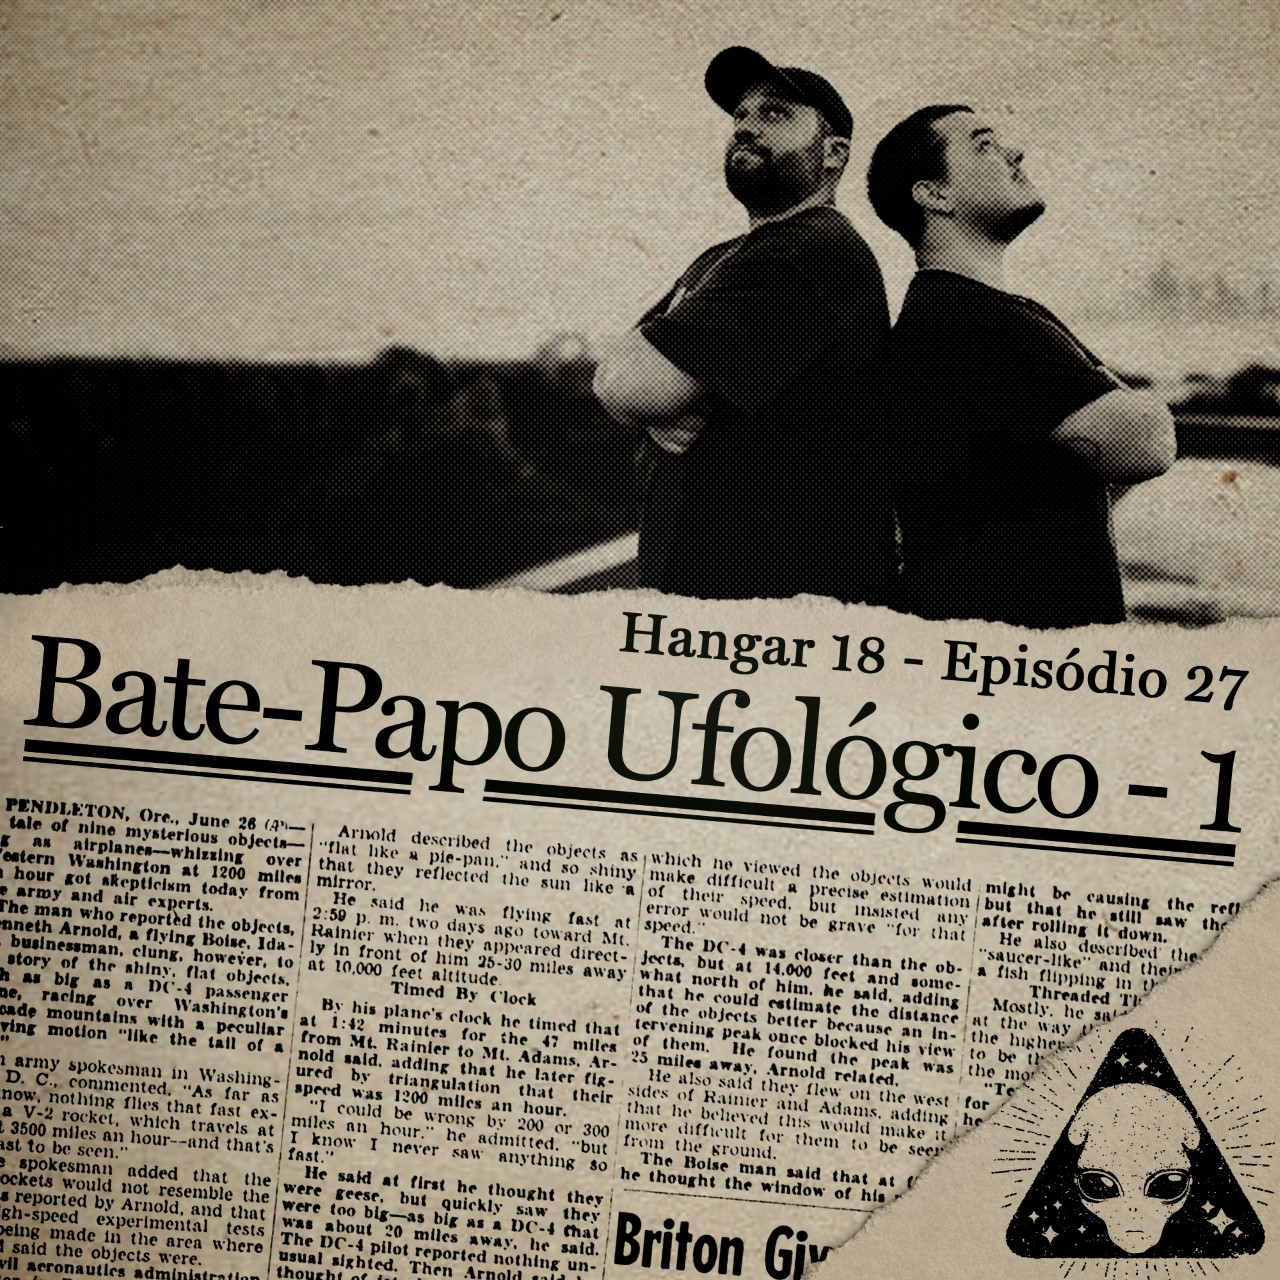 E27 Hangar 18 - Ep 027 - Bate-Papo Ufológico 1